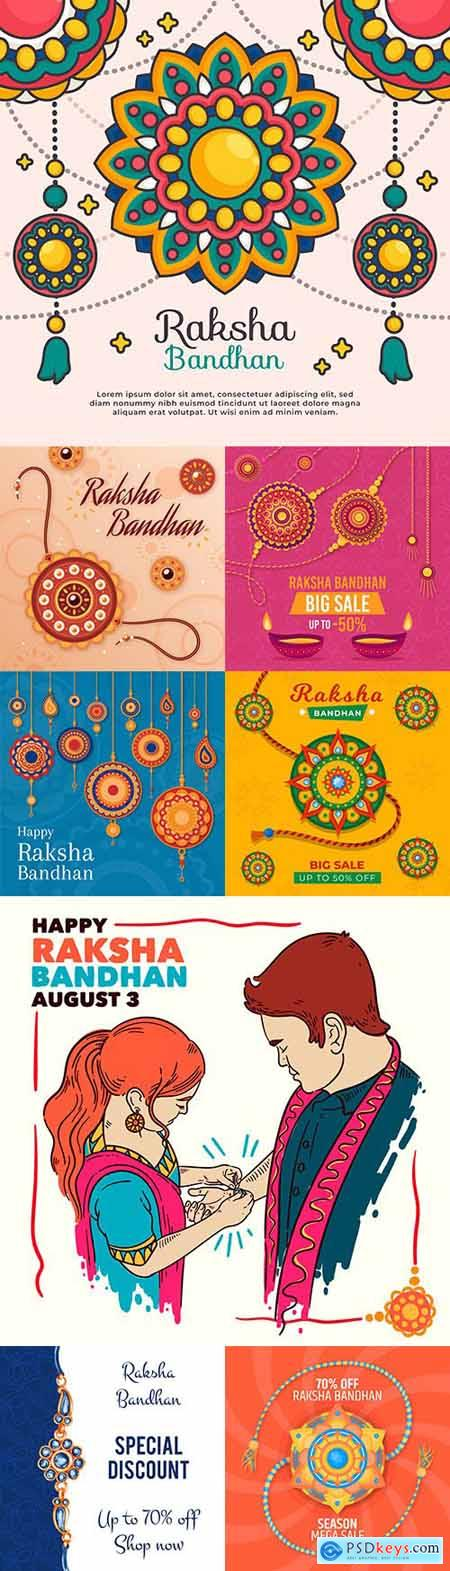 Raksha Bandhan Indian Holiday Flat Design Illustration